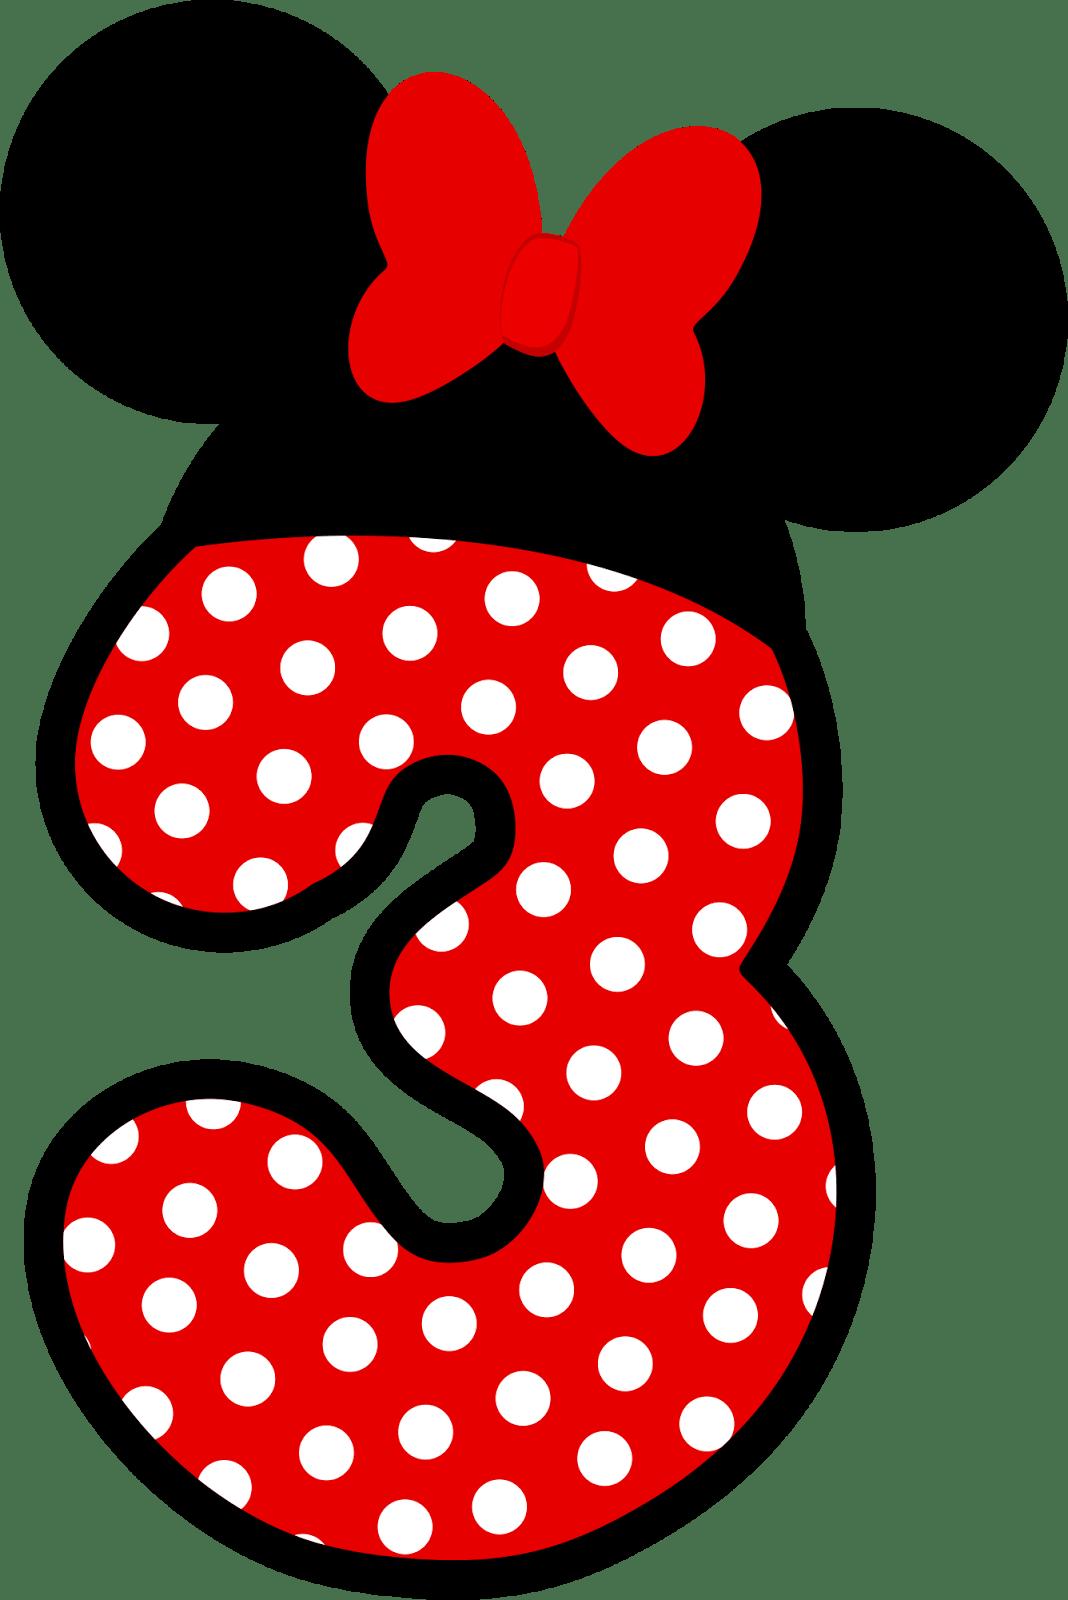 Clipart Clothes Minnie Mouse Clipart Clothes Minnie Mouse